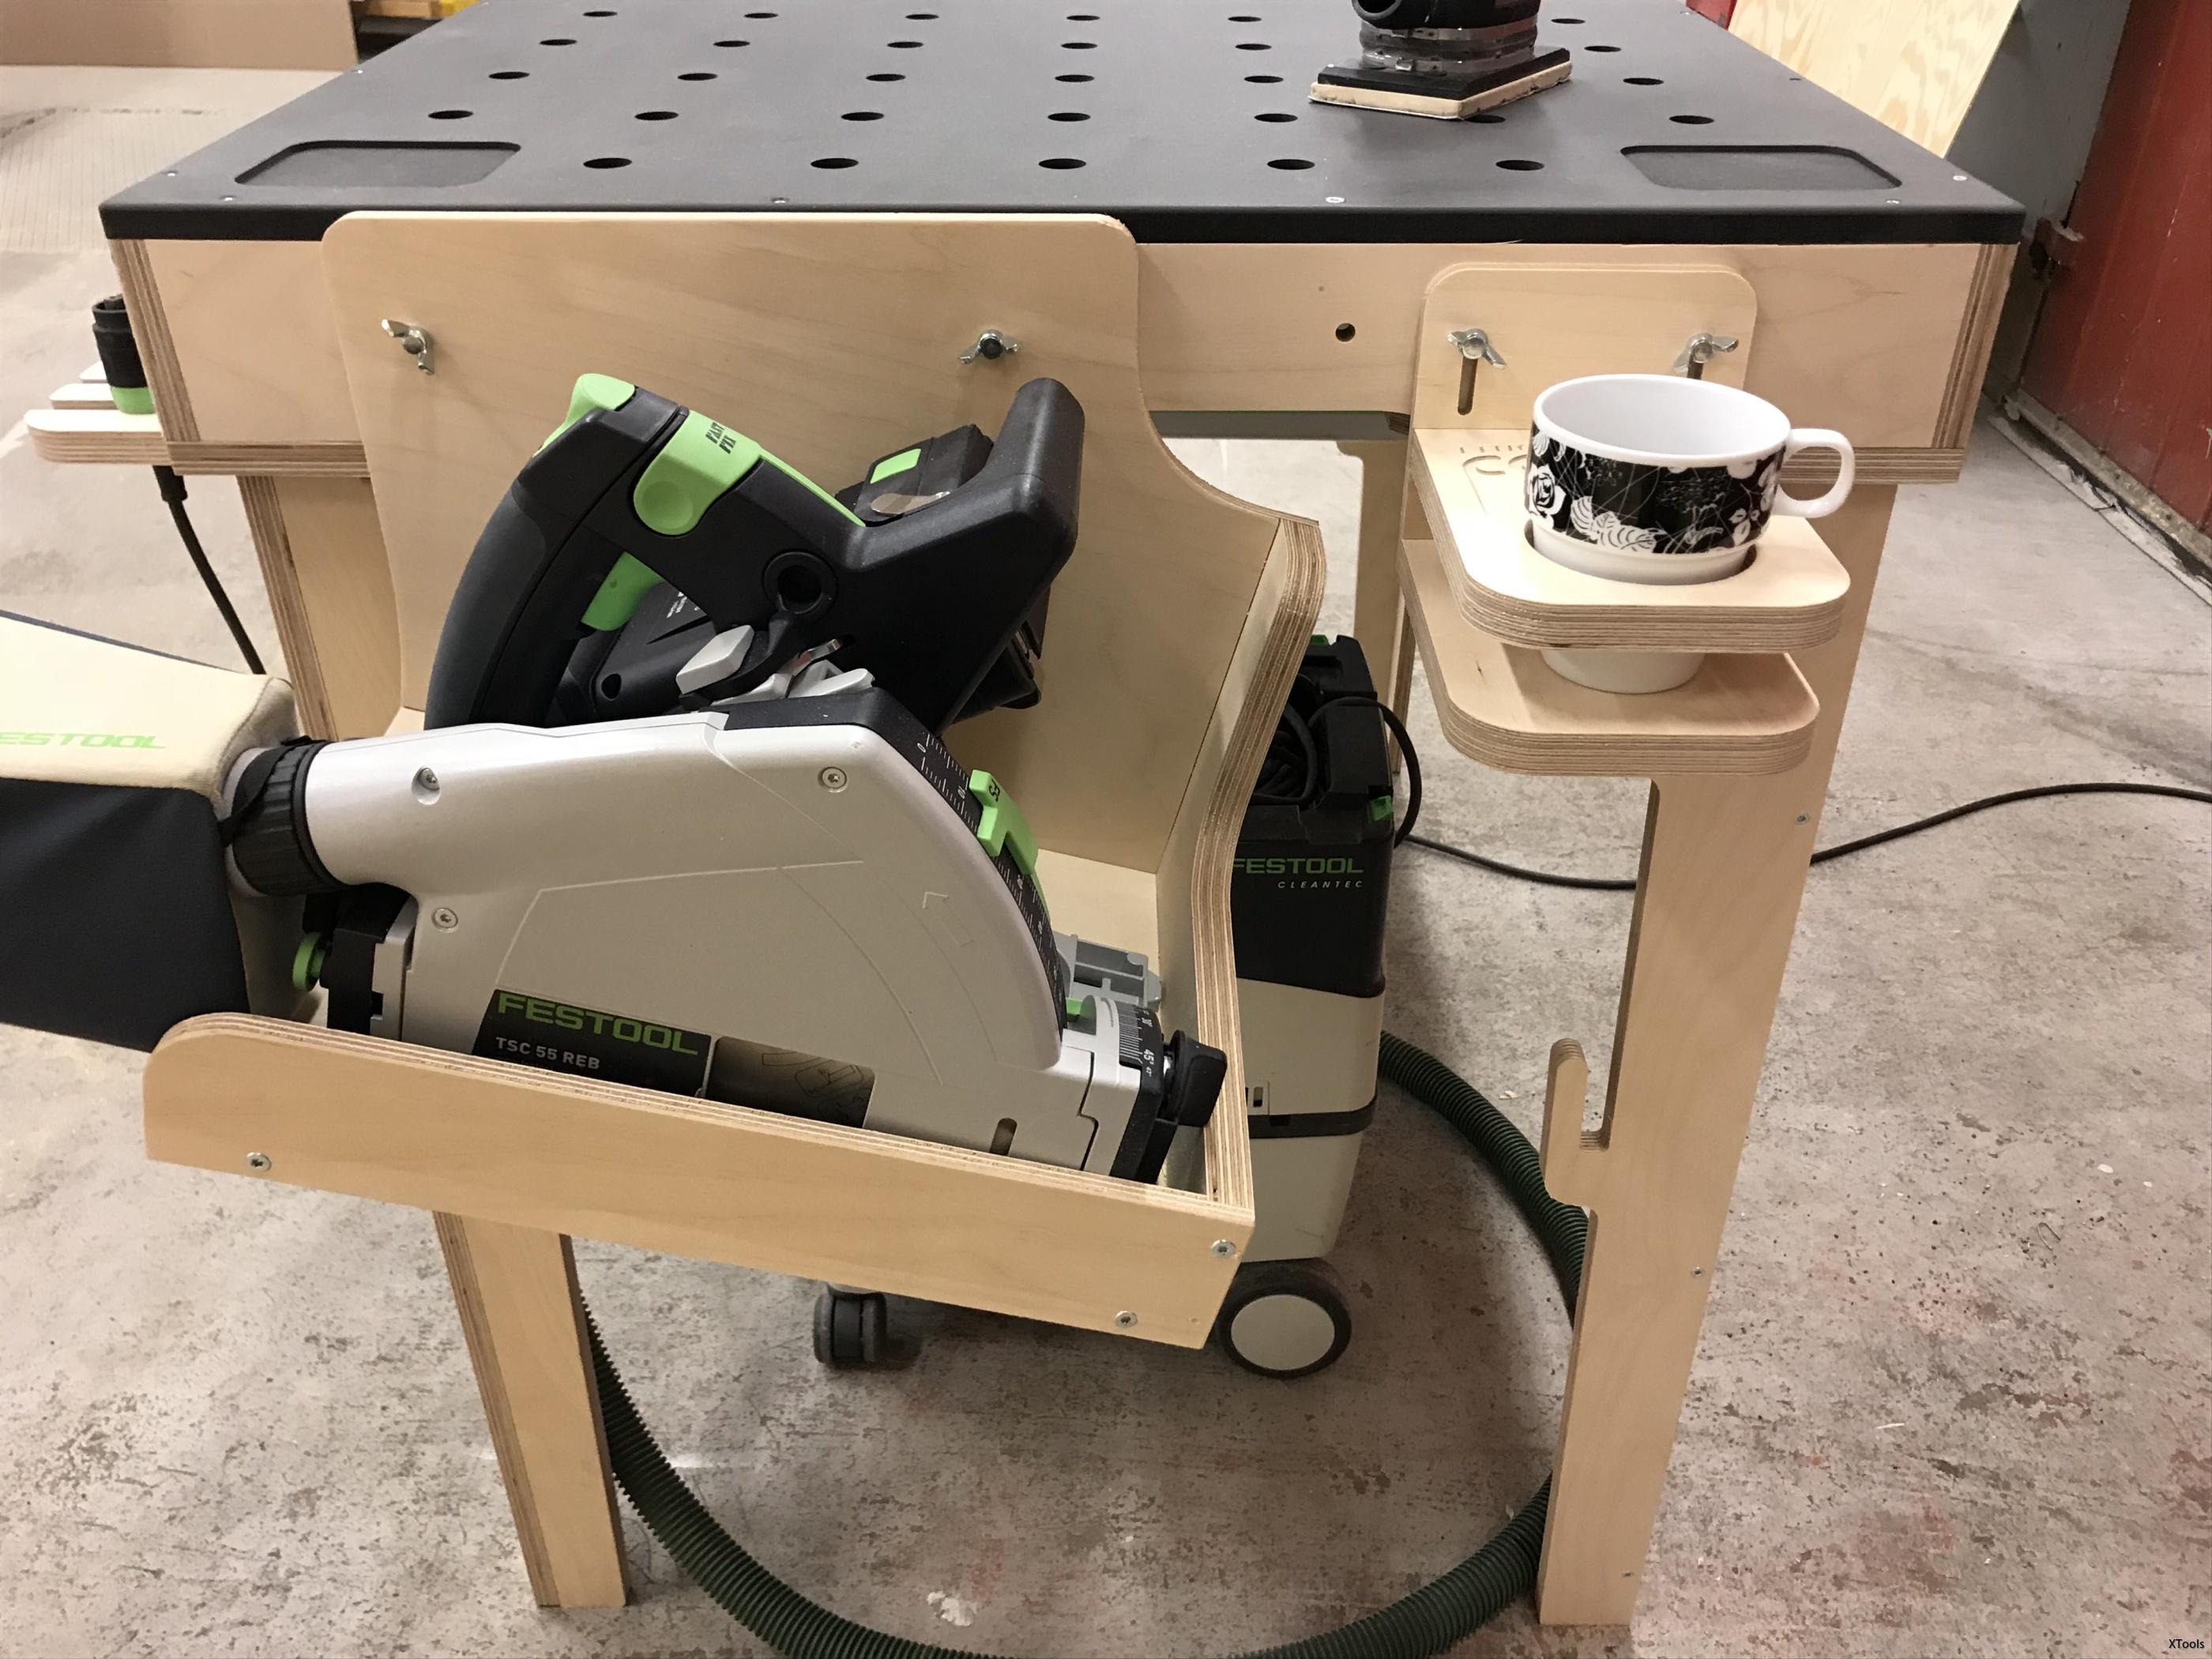 Festool Ts55 Garage Woodworking Workbench Festool